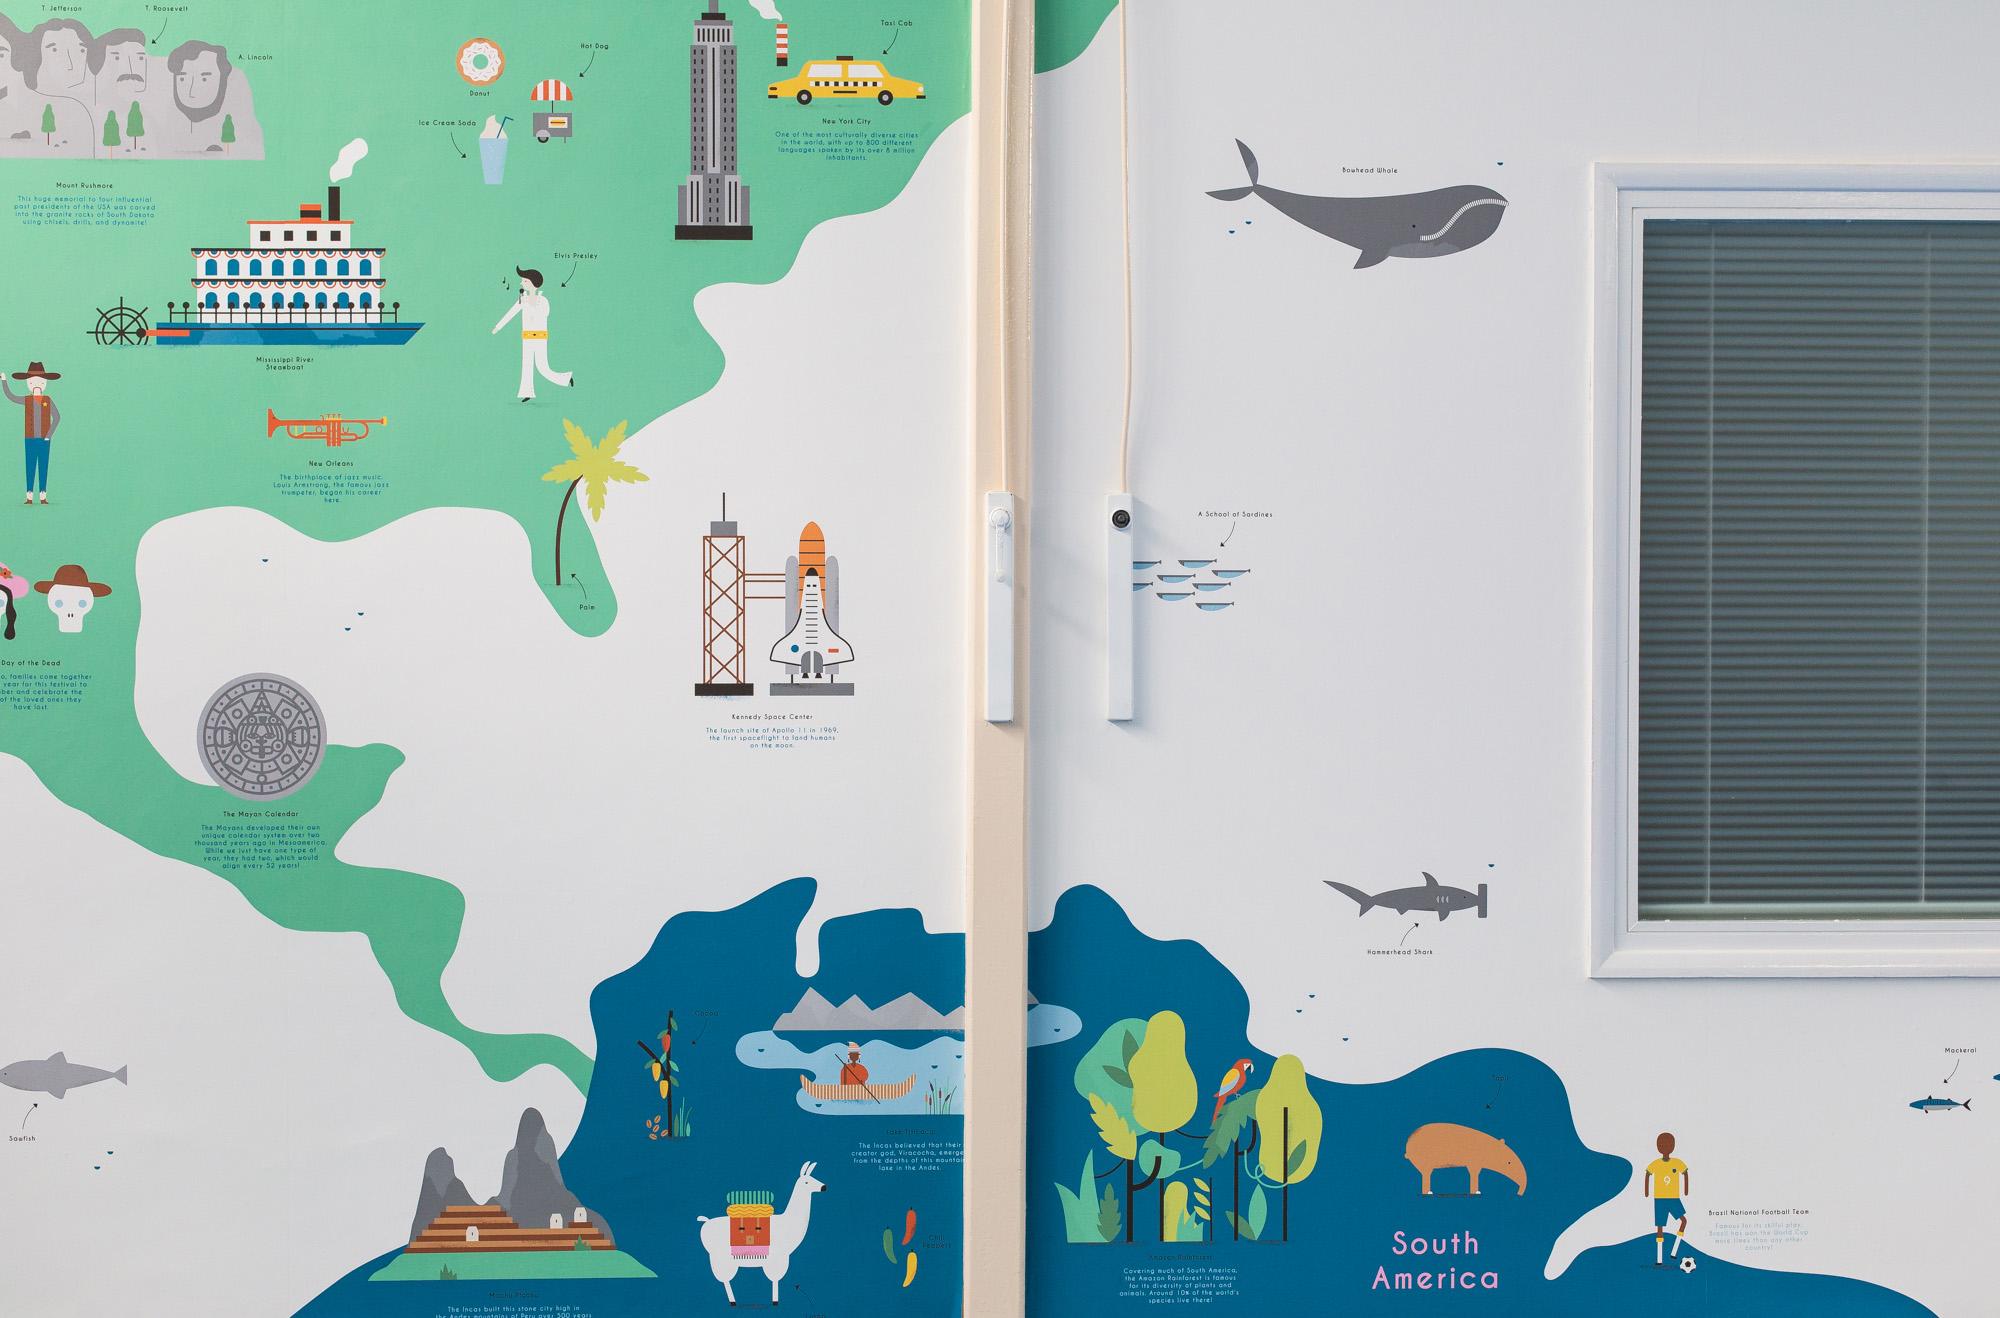 hannahalice-illustration-spacedesign-world-map-grazebrookprimaryschool-mural-northamerica-southamerica-wallpaper.jpg